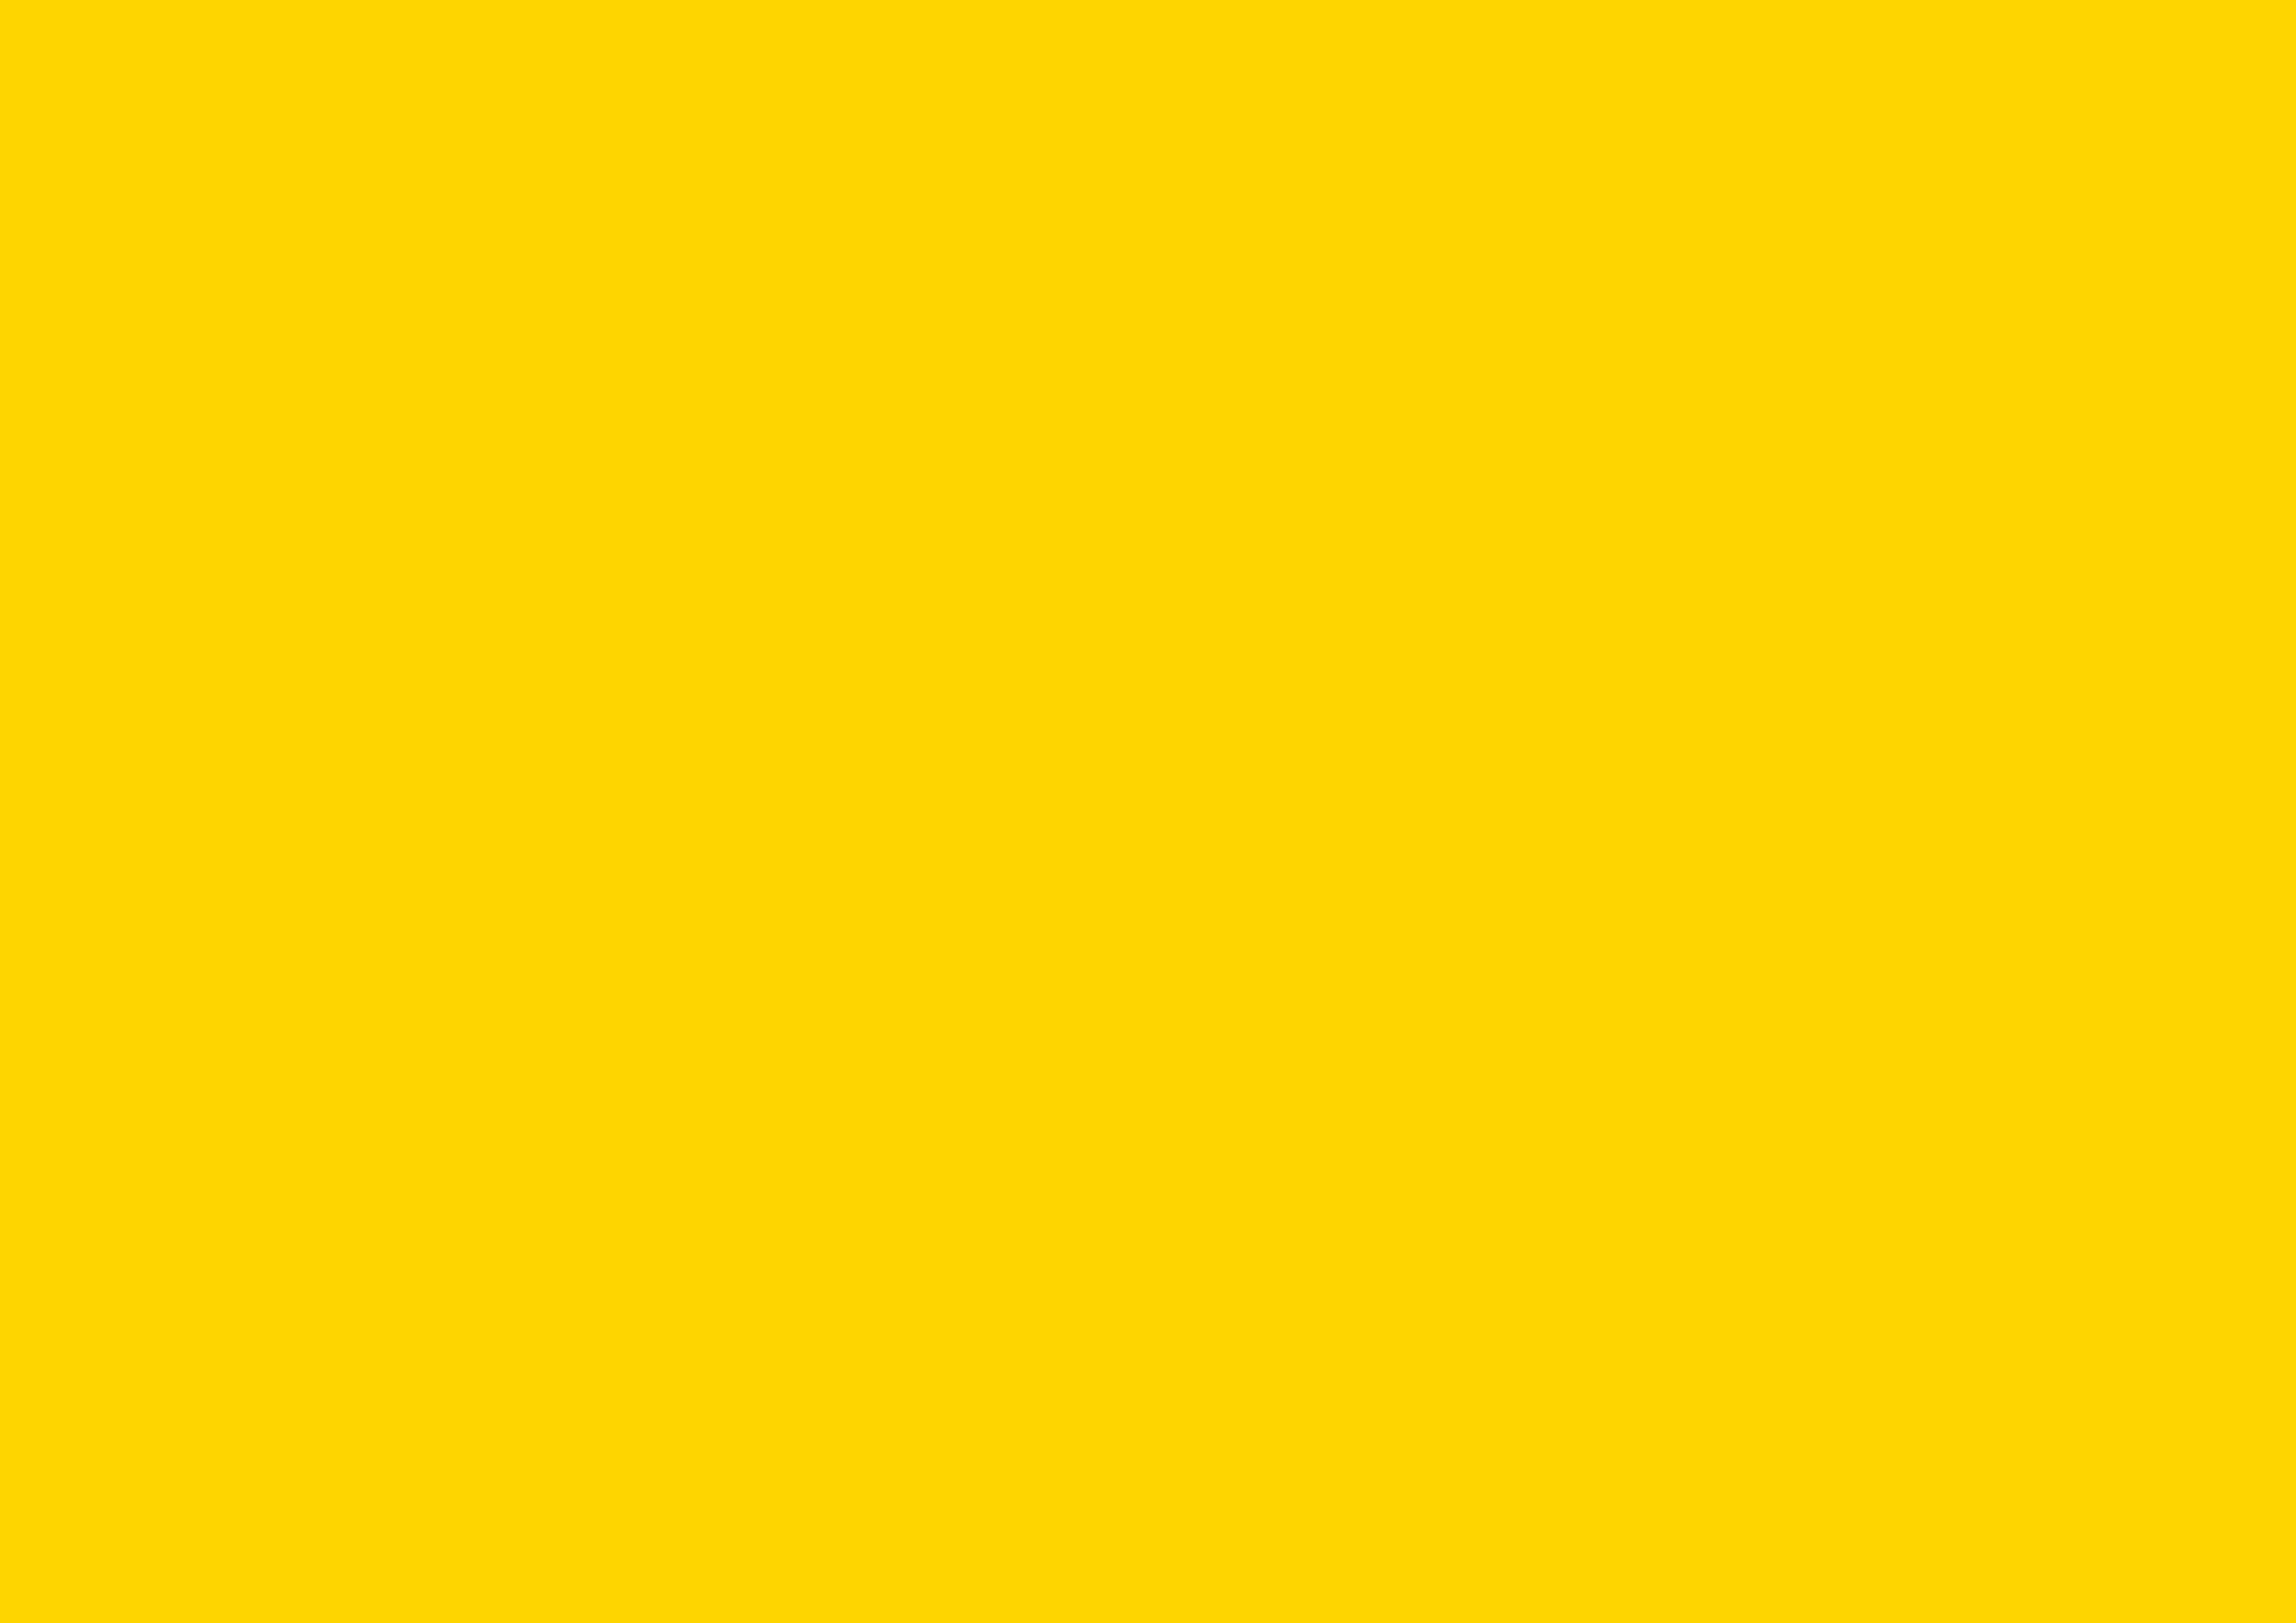 3508x2480 Gold Web Golden Solid Color Background